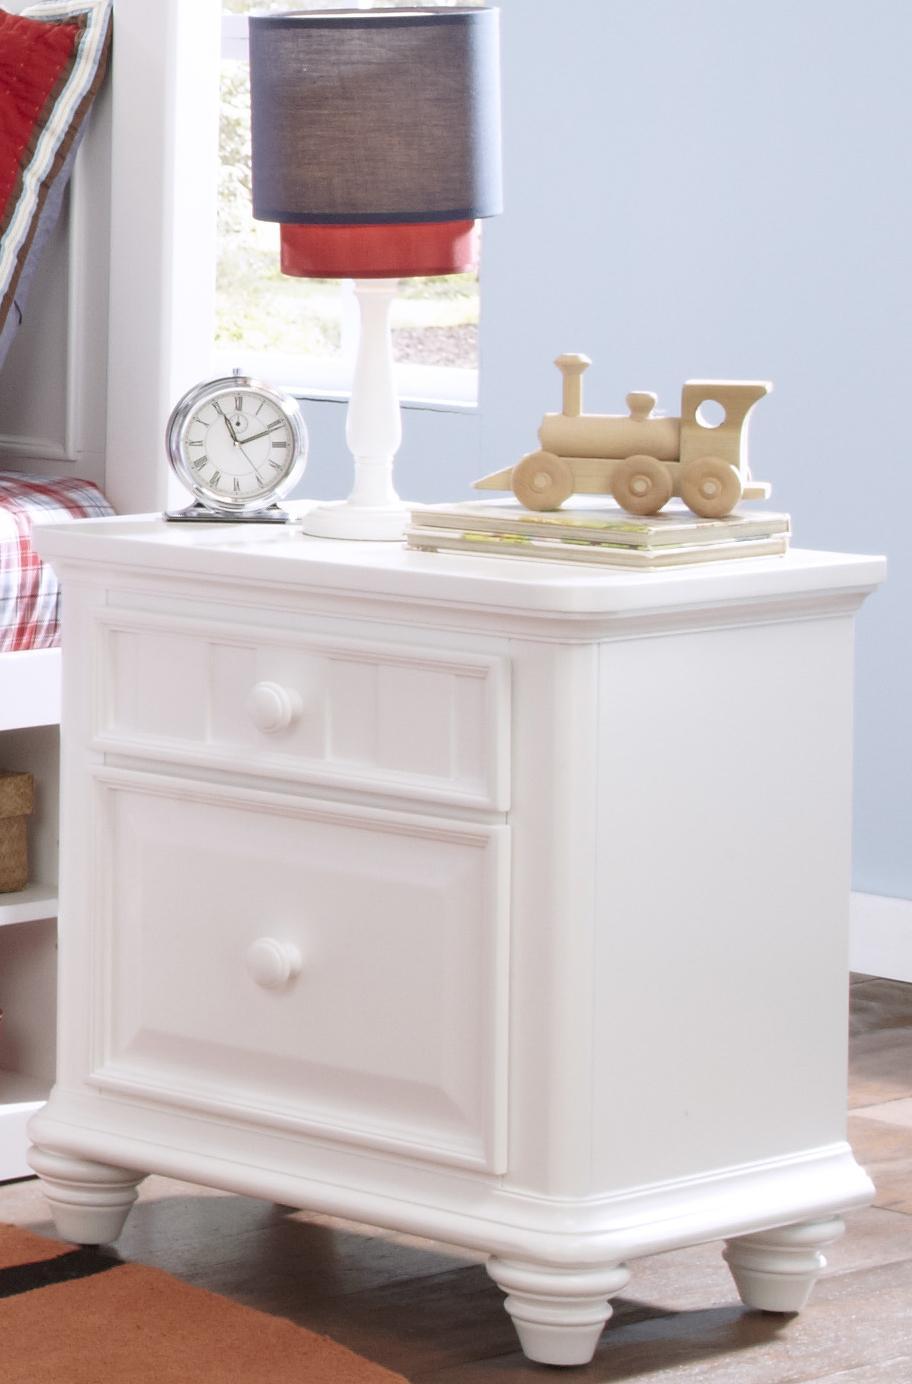 Morris Home Furnishings Shelbourne Shelbourne Nightstand - Item Number: 8466-450